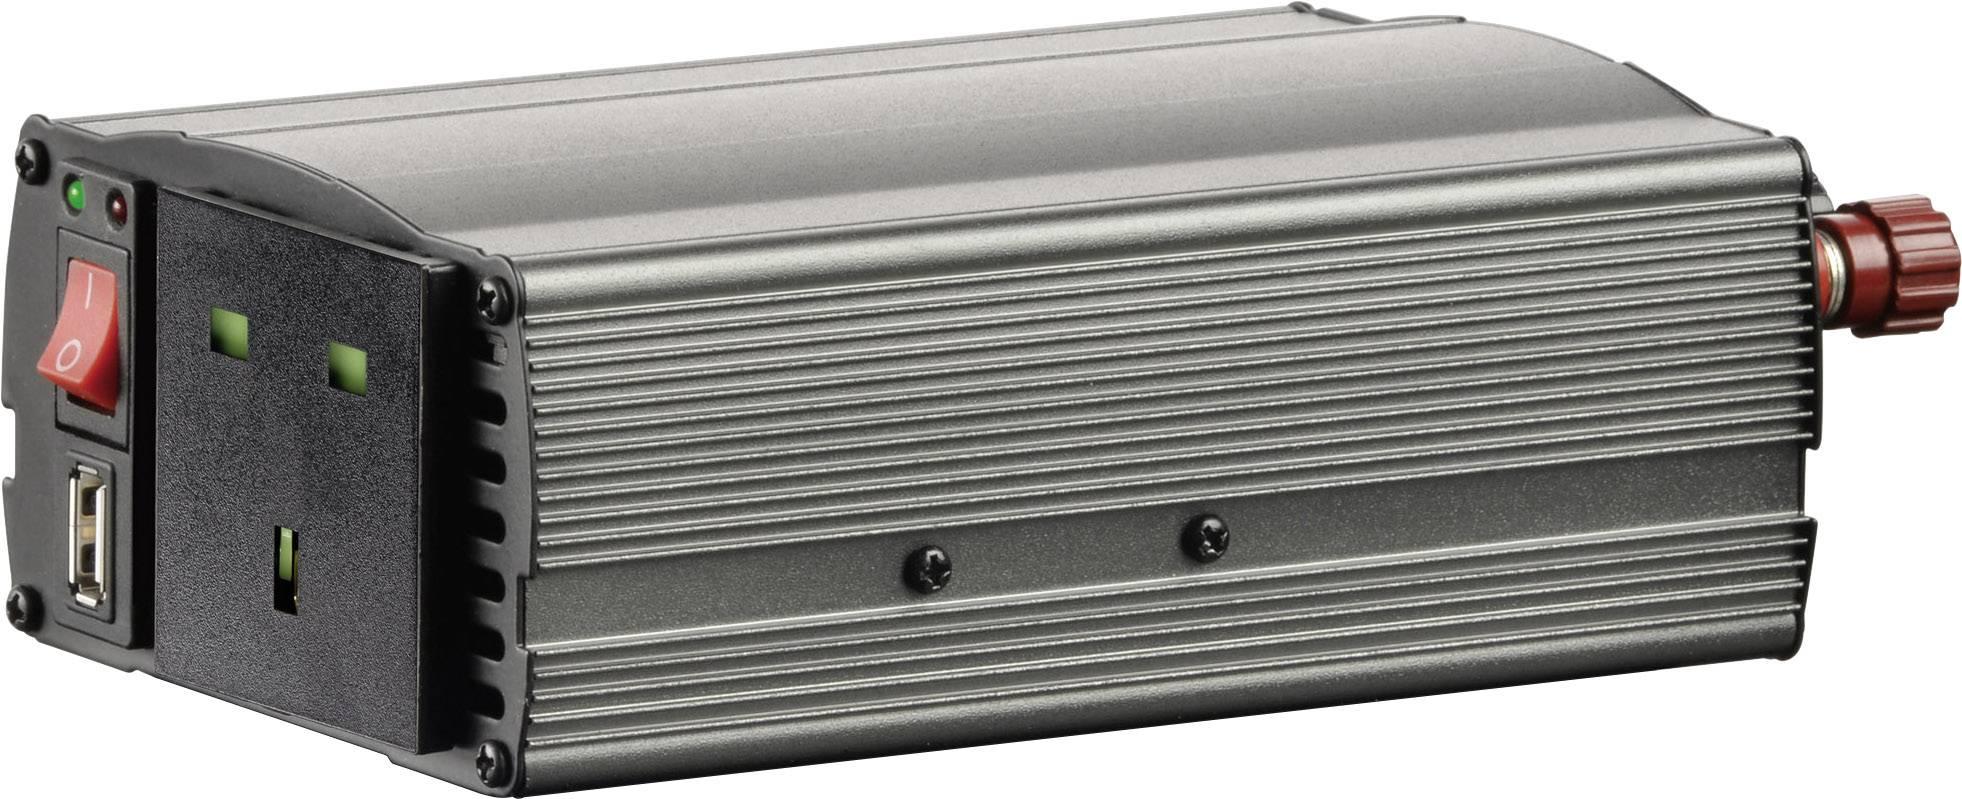 Konvertor VOLTCRAFT MSW 300-24-UK, 300 W, 24 V/DC/230 V/AC, 300 W